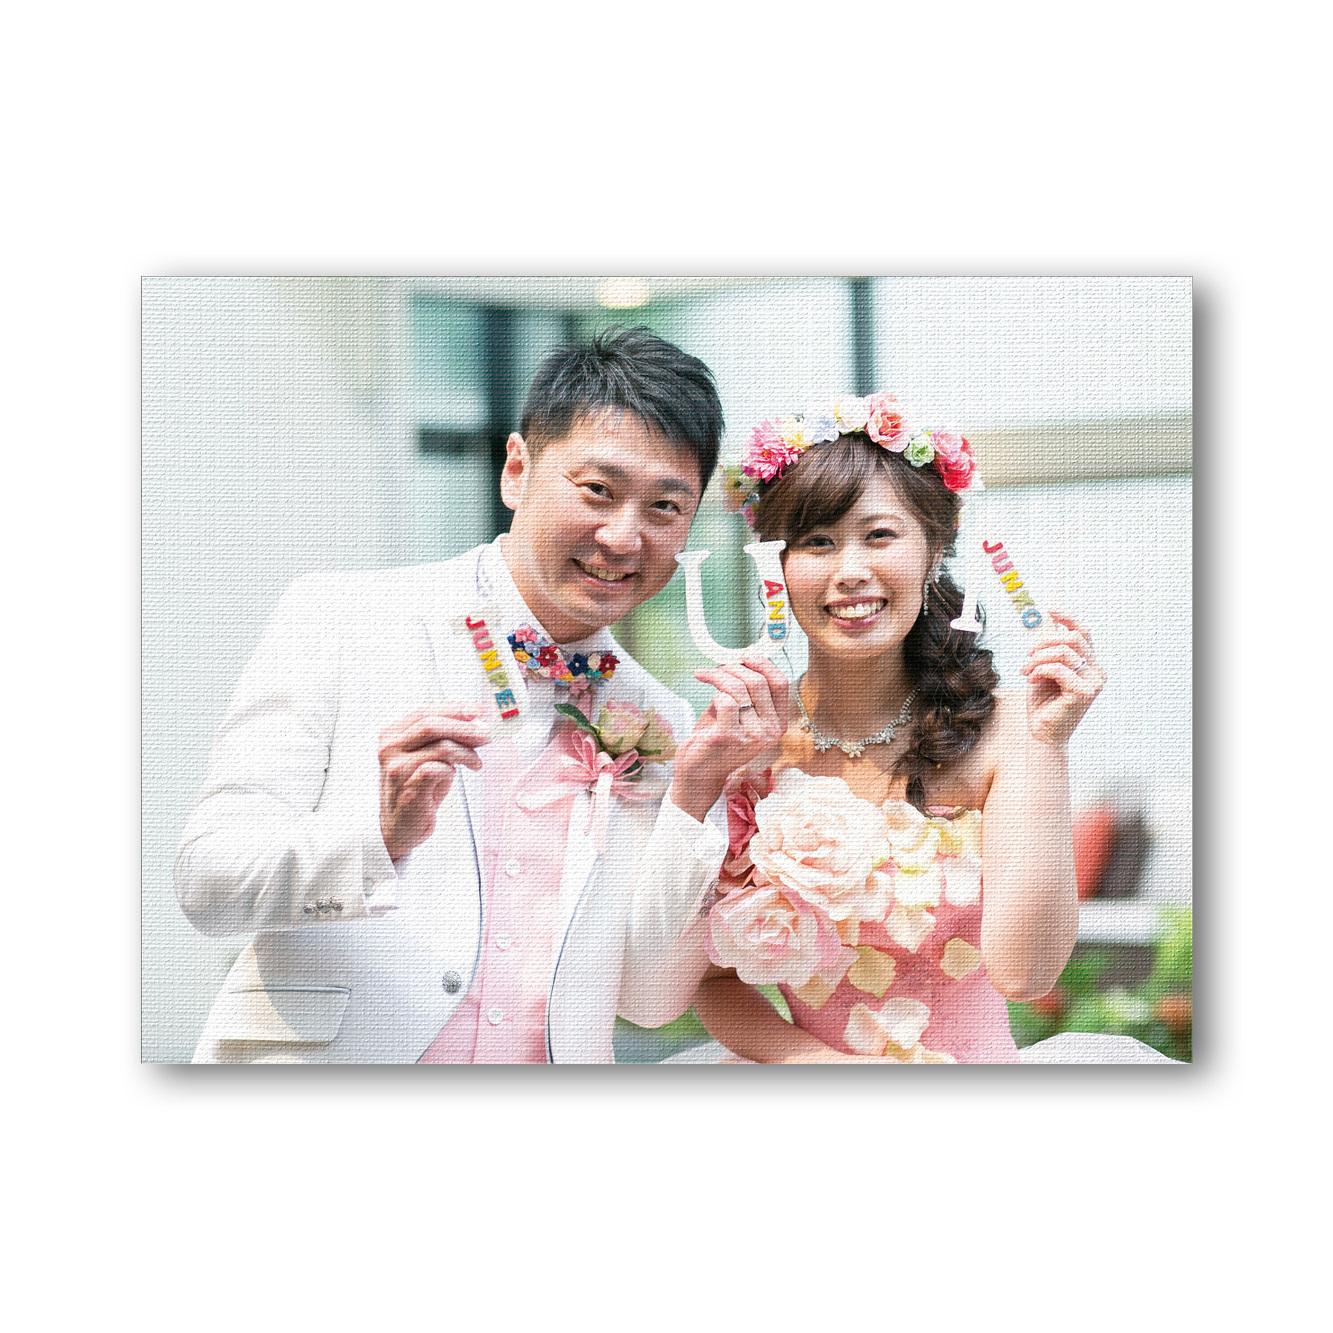 B_design_mirai_murakami_2088_F.jpg